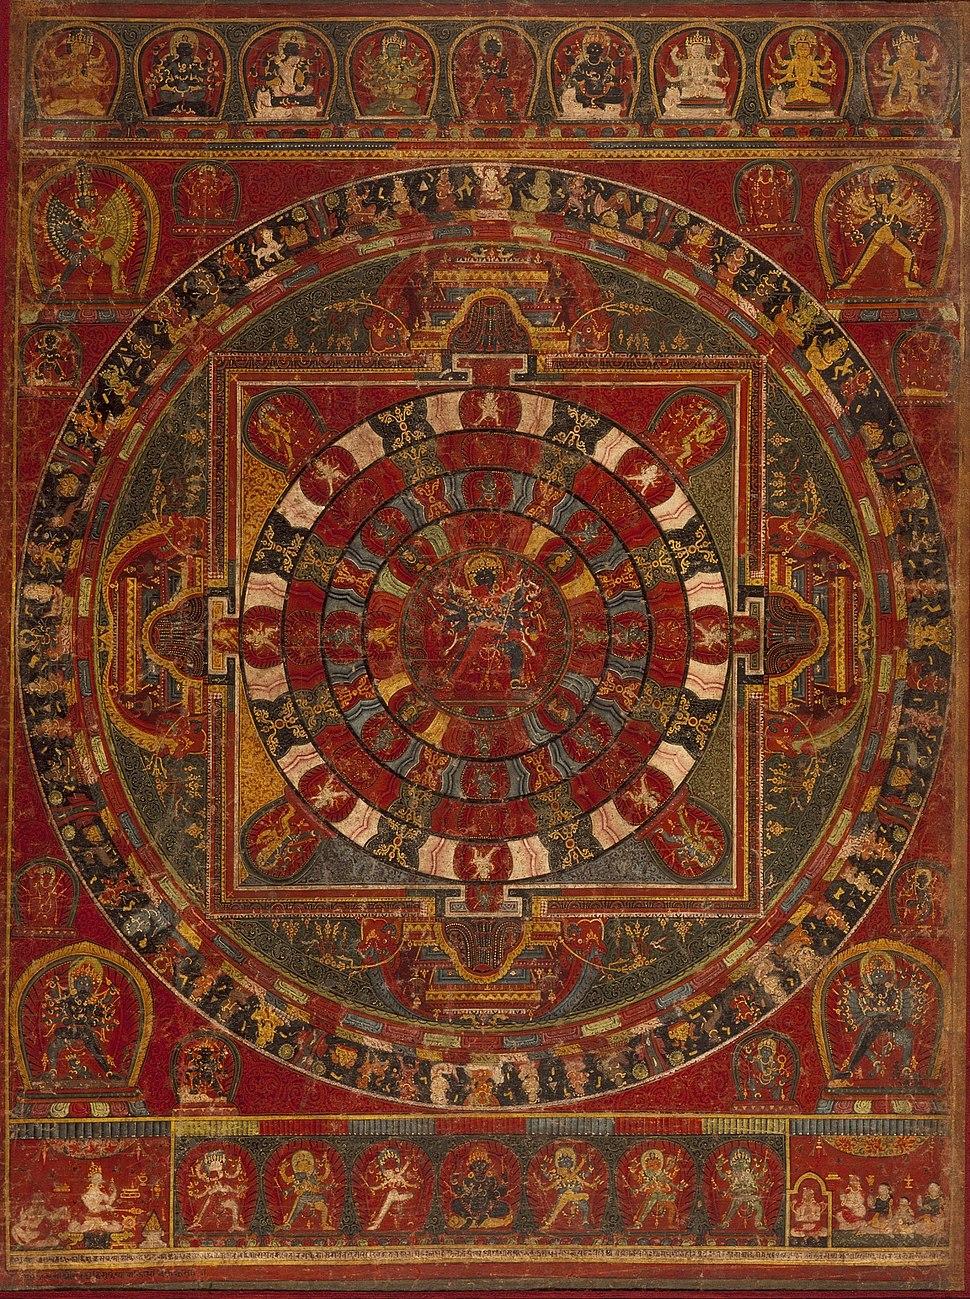 Mandala of the Buddhist Deity Chakrasamvara LACMA M.73.2.1